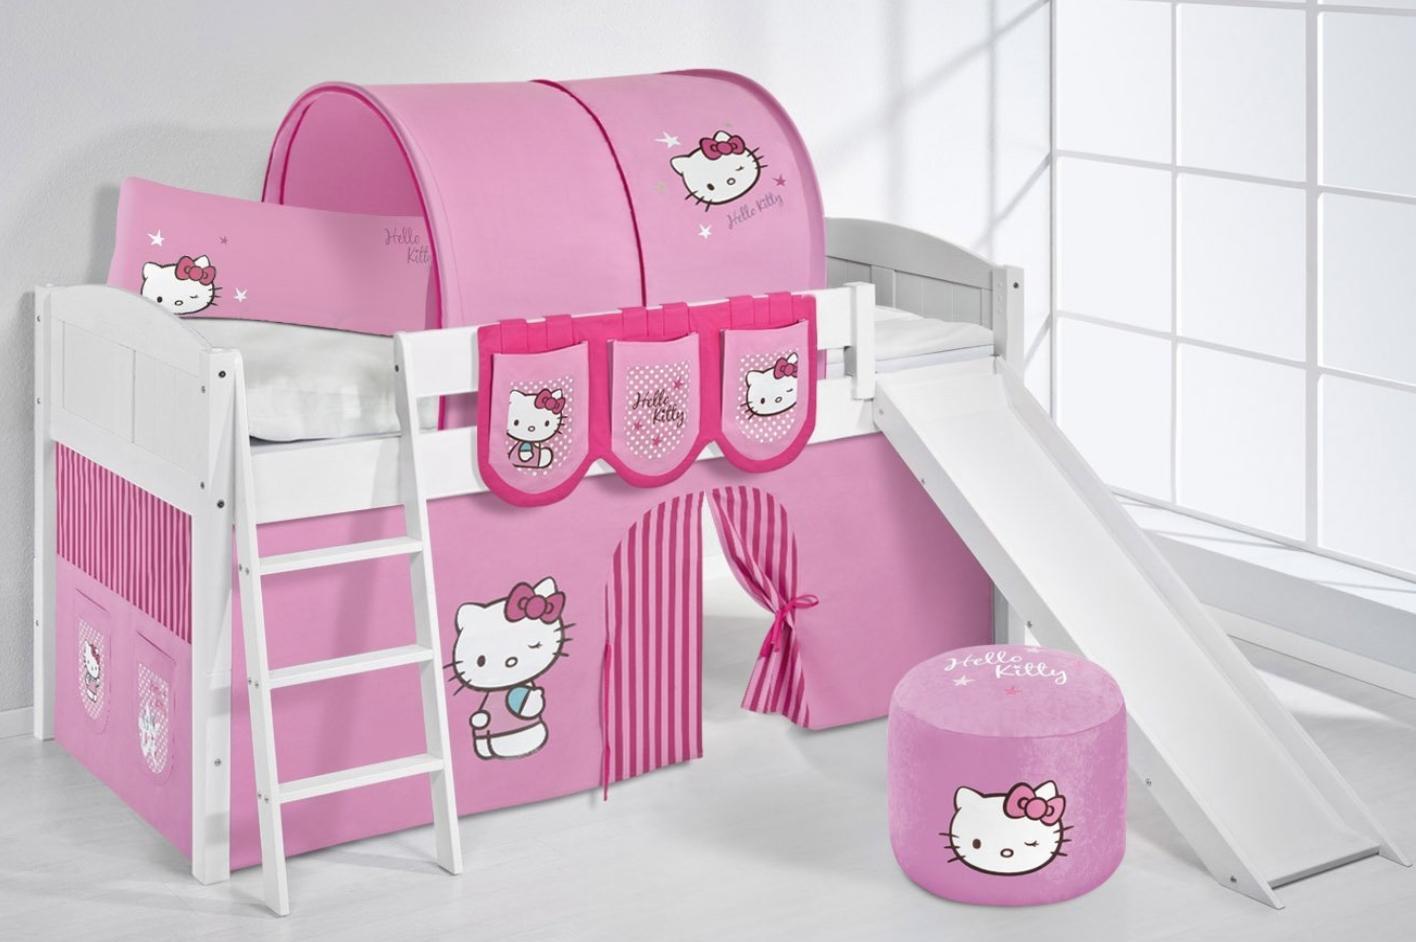 lit sur lev blanc laqu toboggan ida rideau hello kitty. Black Bedroom Furniture Sets. Home Design Ideas